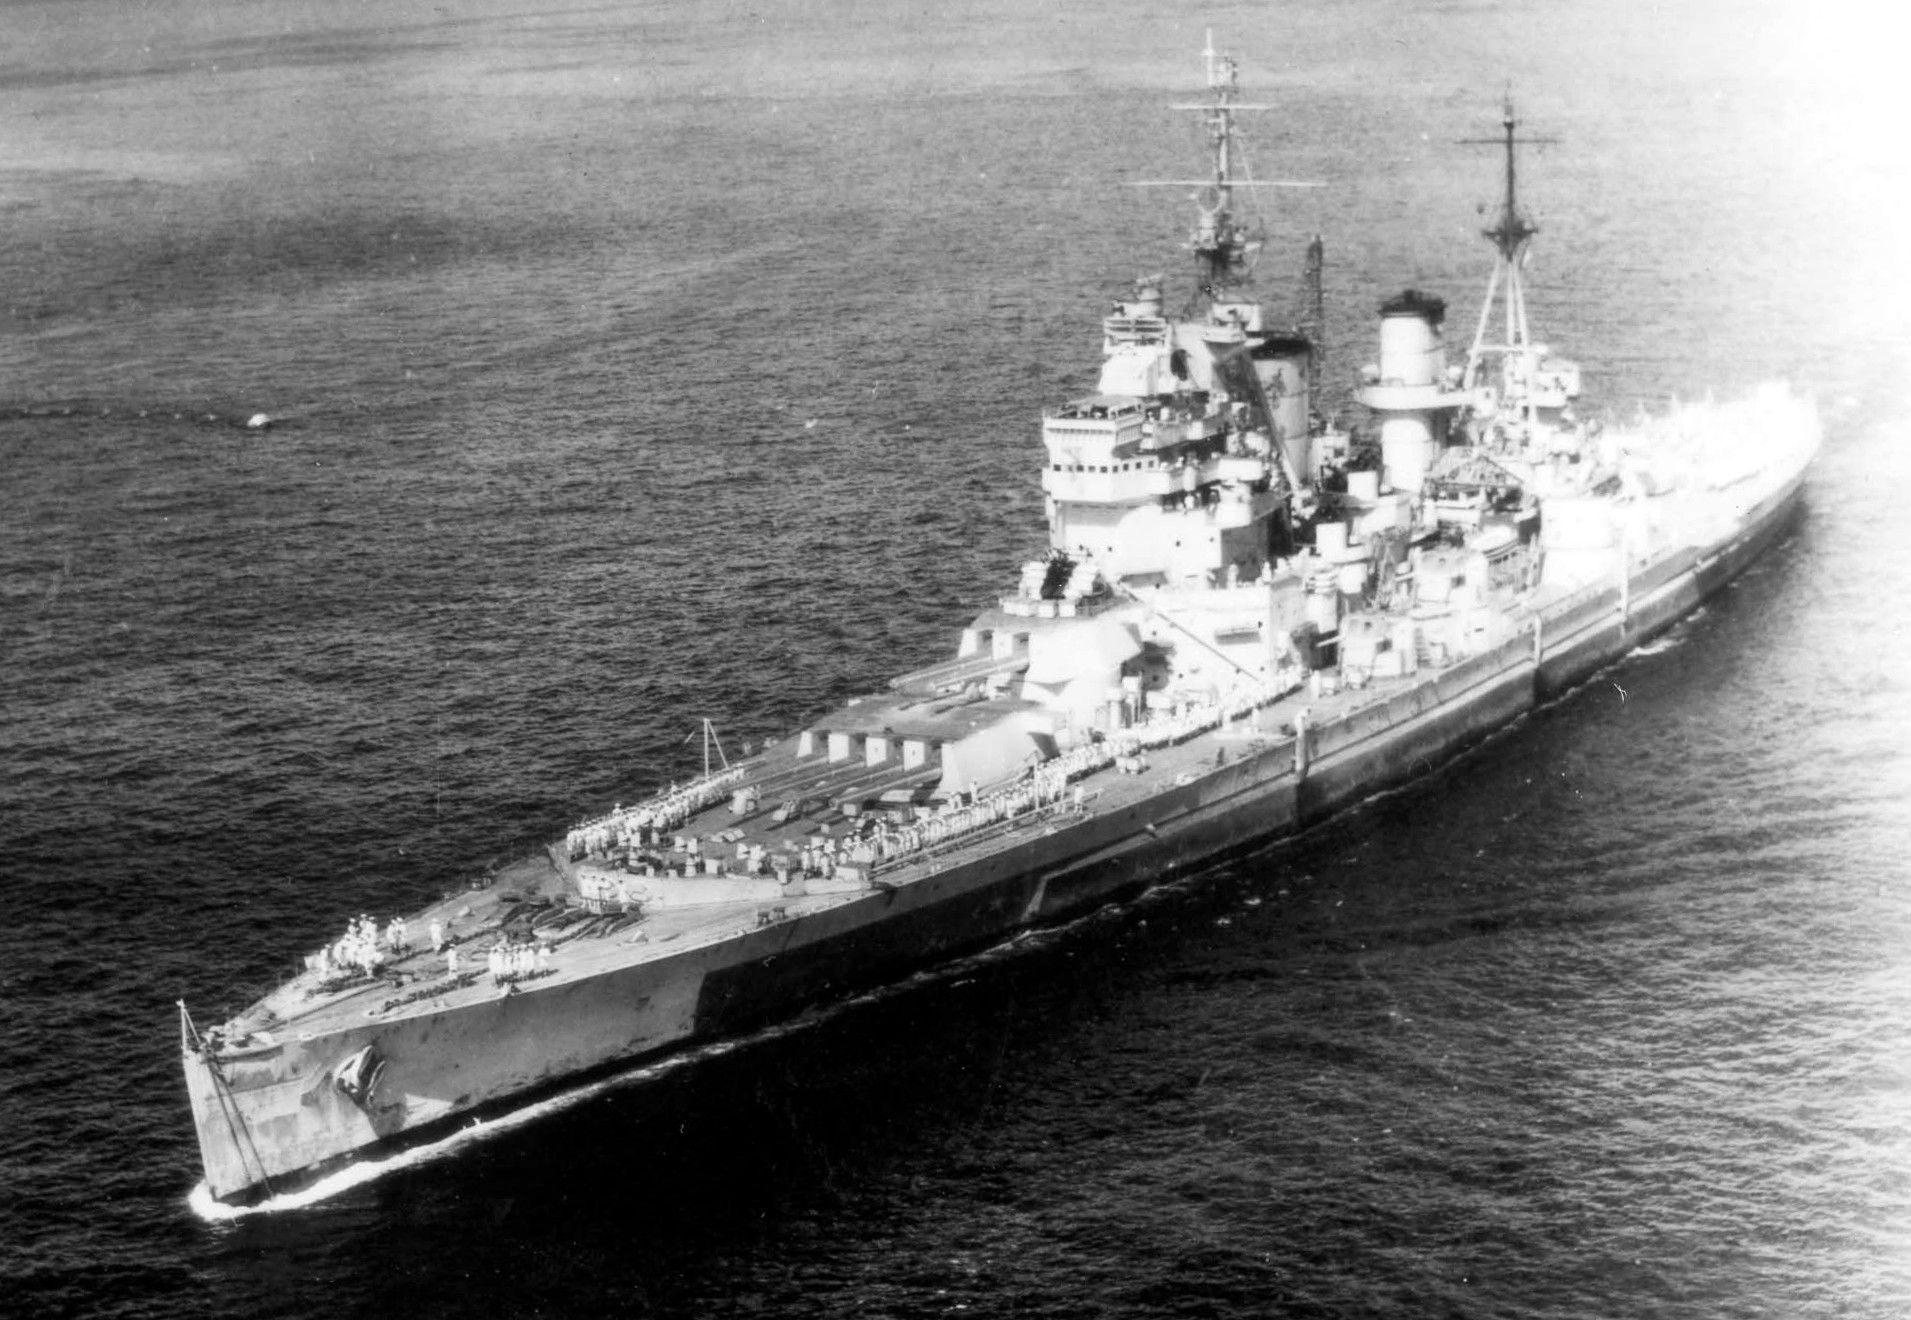 HMS King George V entering Apra Harbor, Guam, Mariana Islands, 1945. [1911X1320]